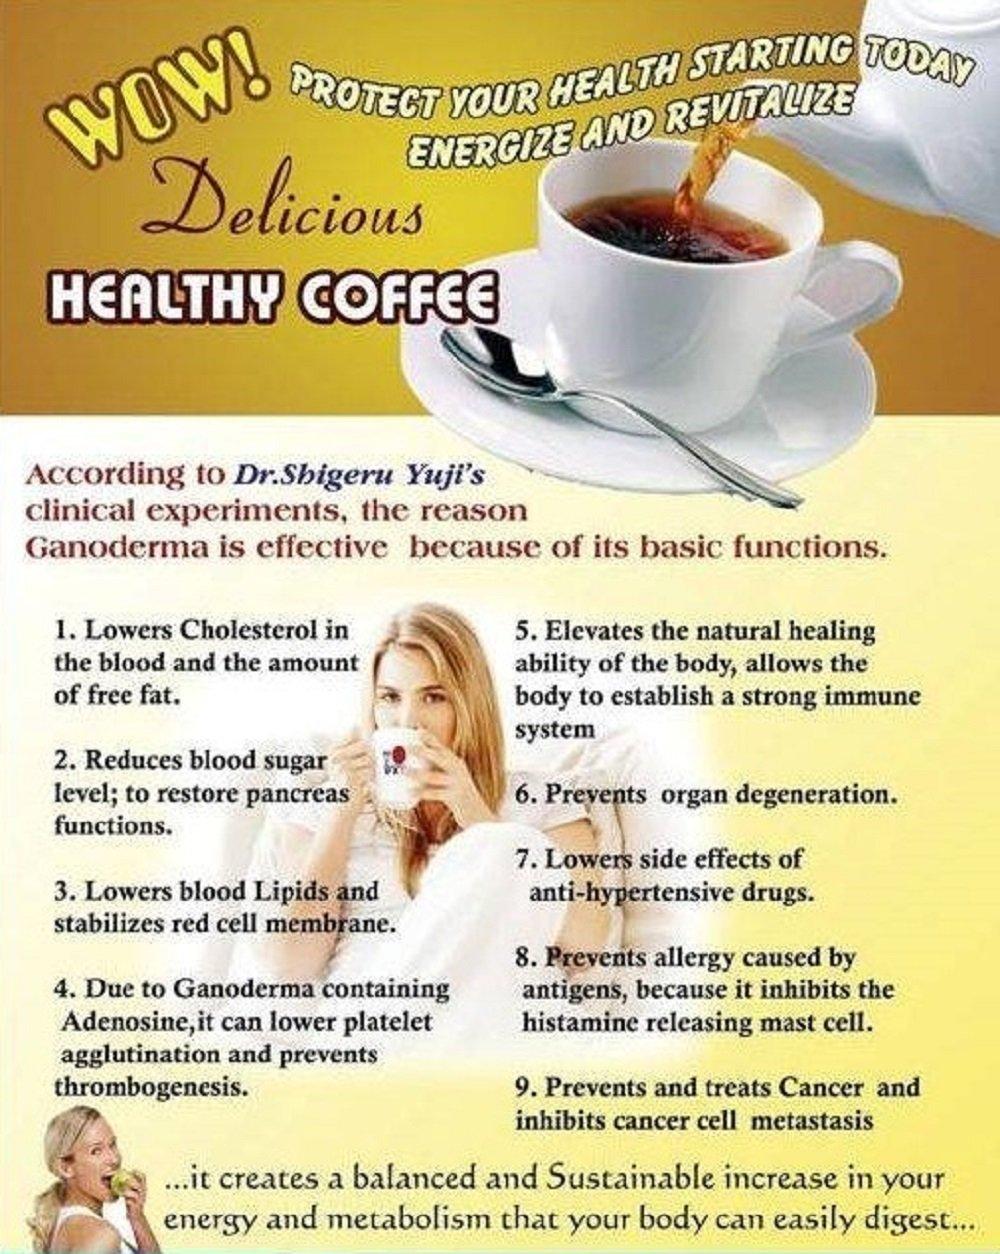 4 Packs DXN Lingzhi 3 in 1 Lite Ganoderma Coffee 20 Sachets 61cKWzpxuSL